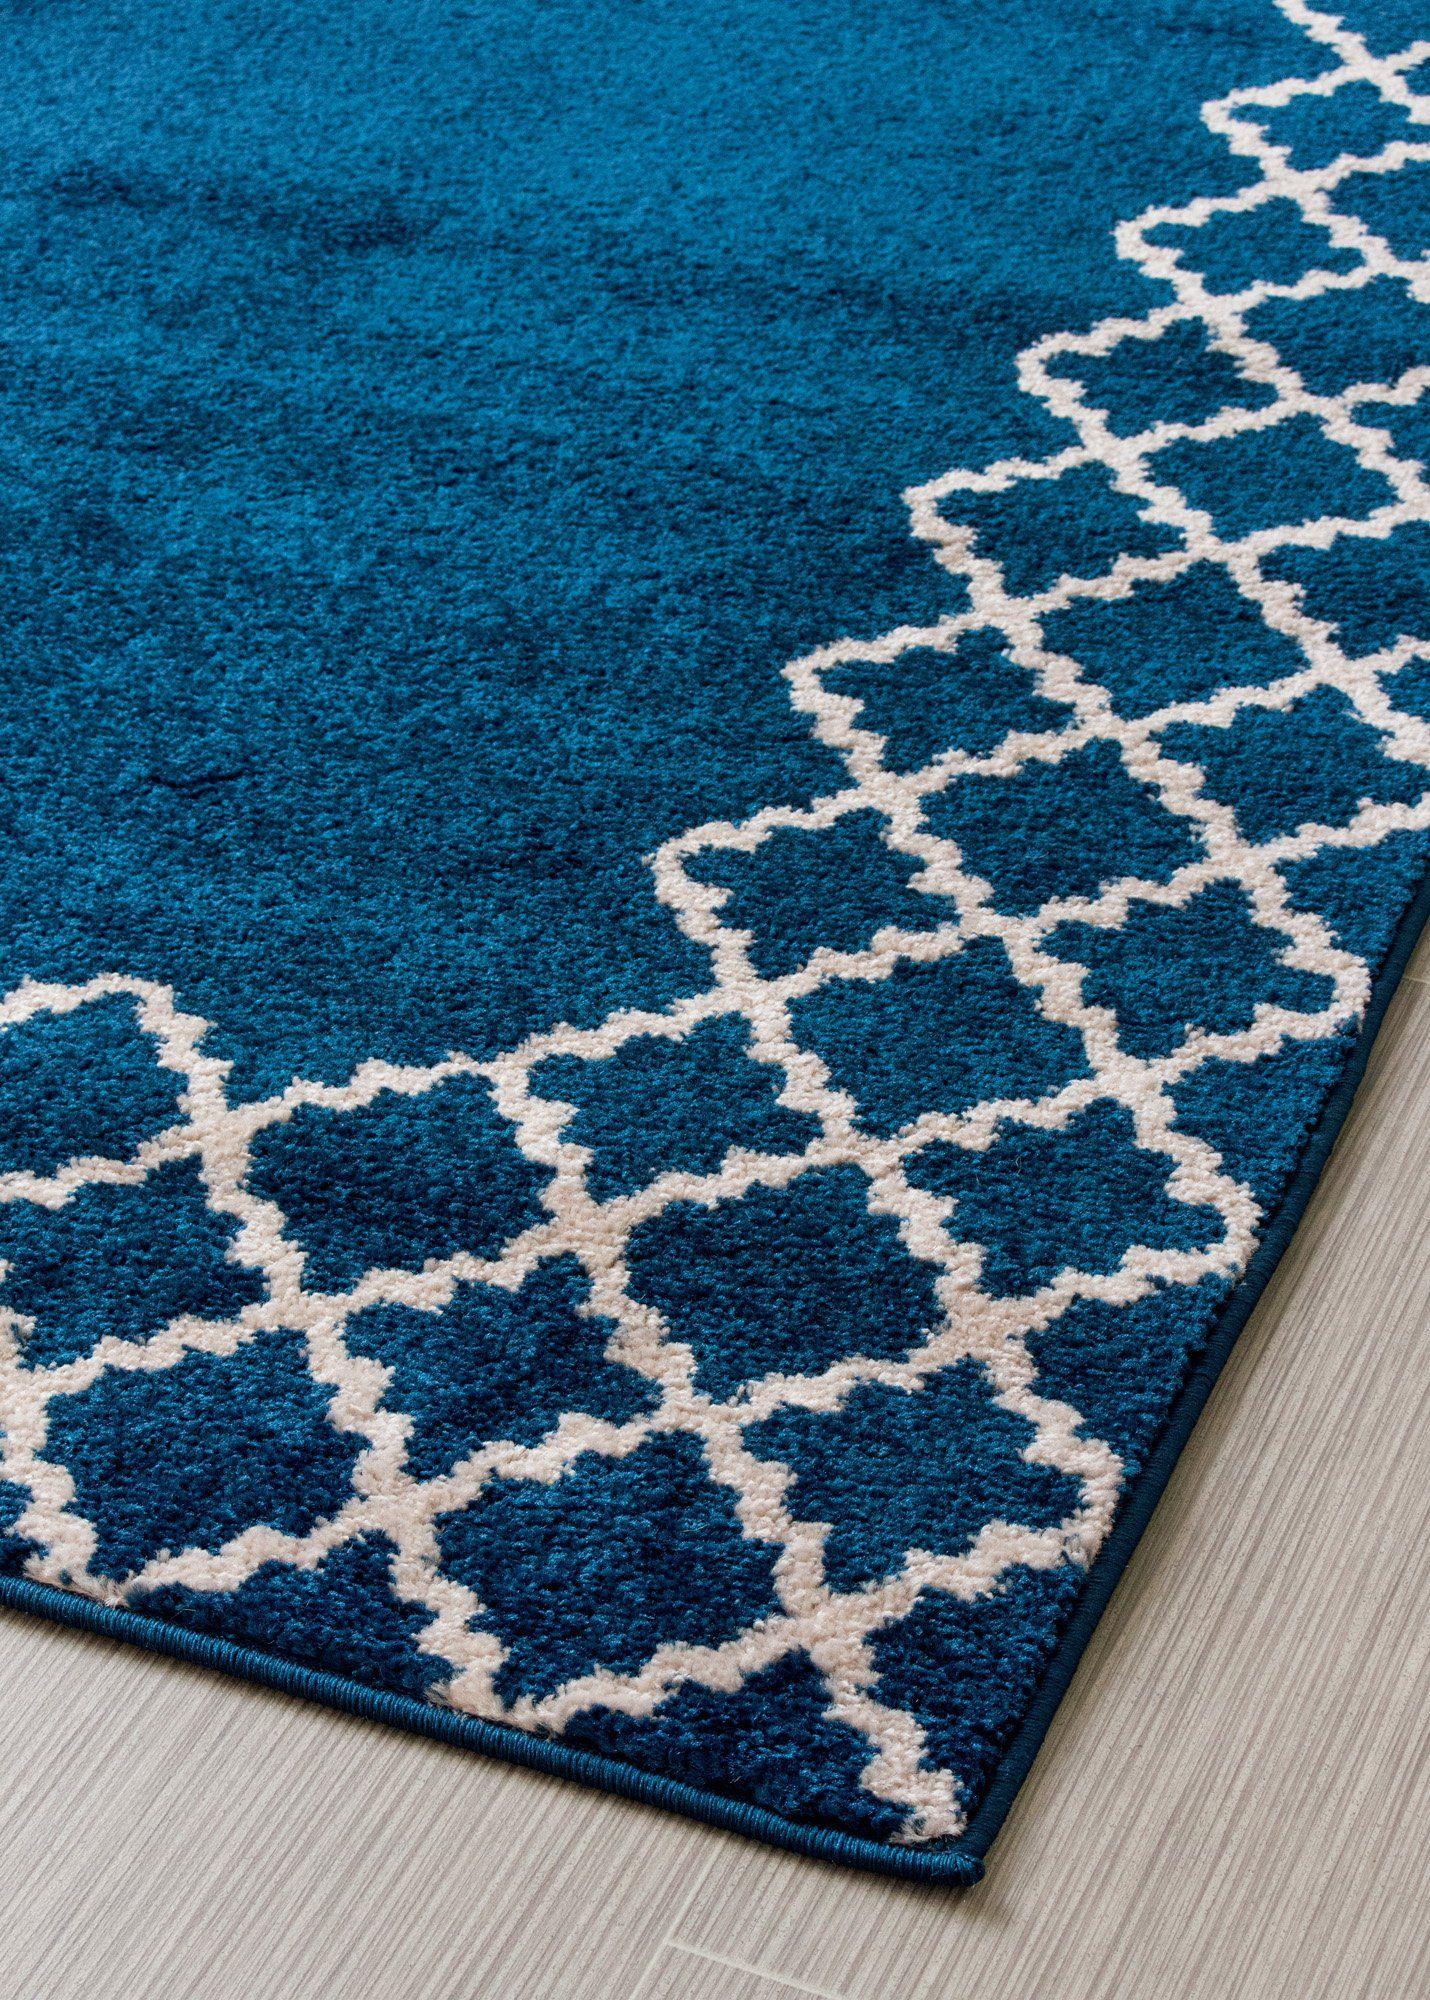 ivory blue trellis border rug modern transitional contemporary